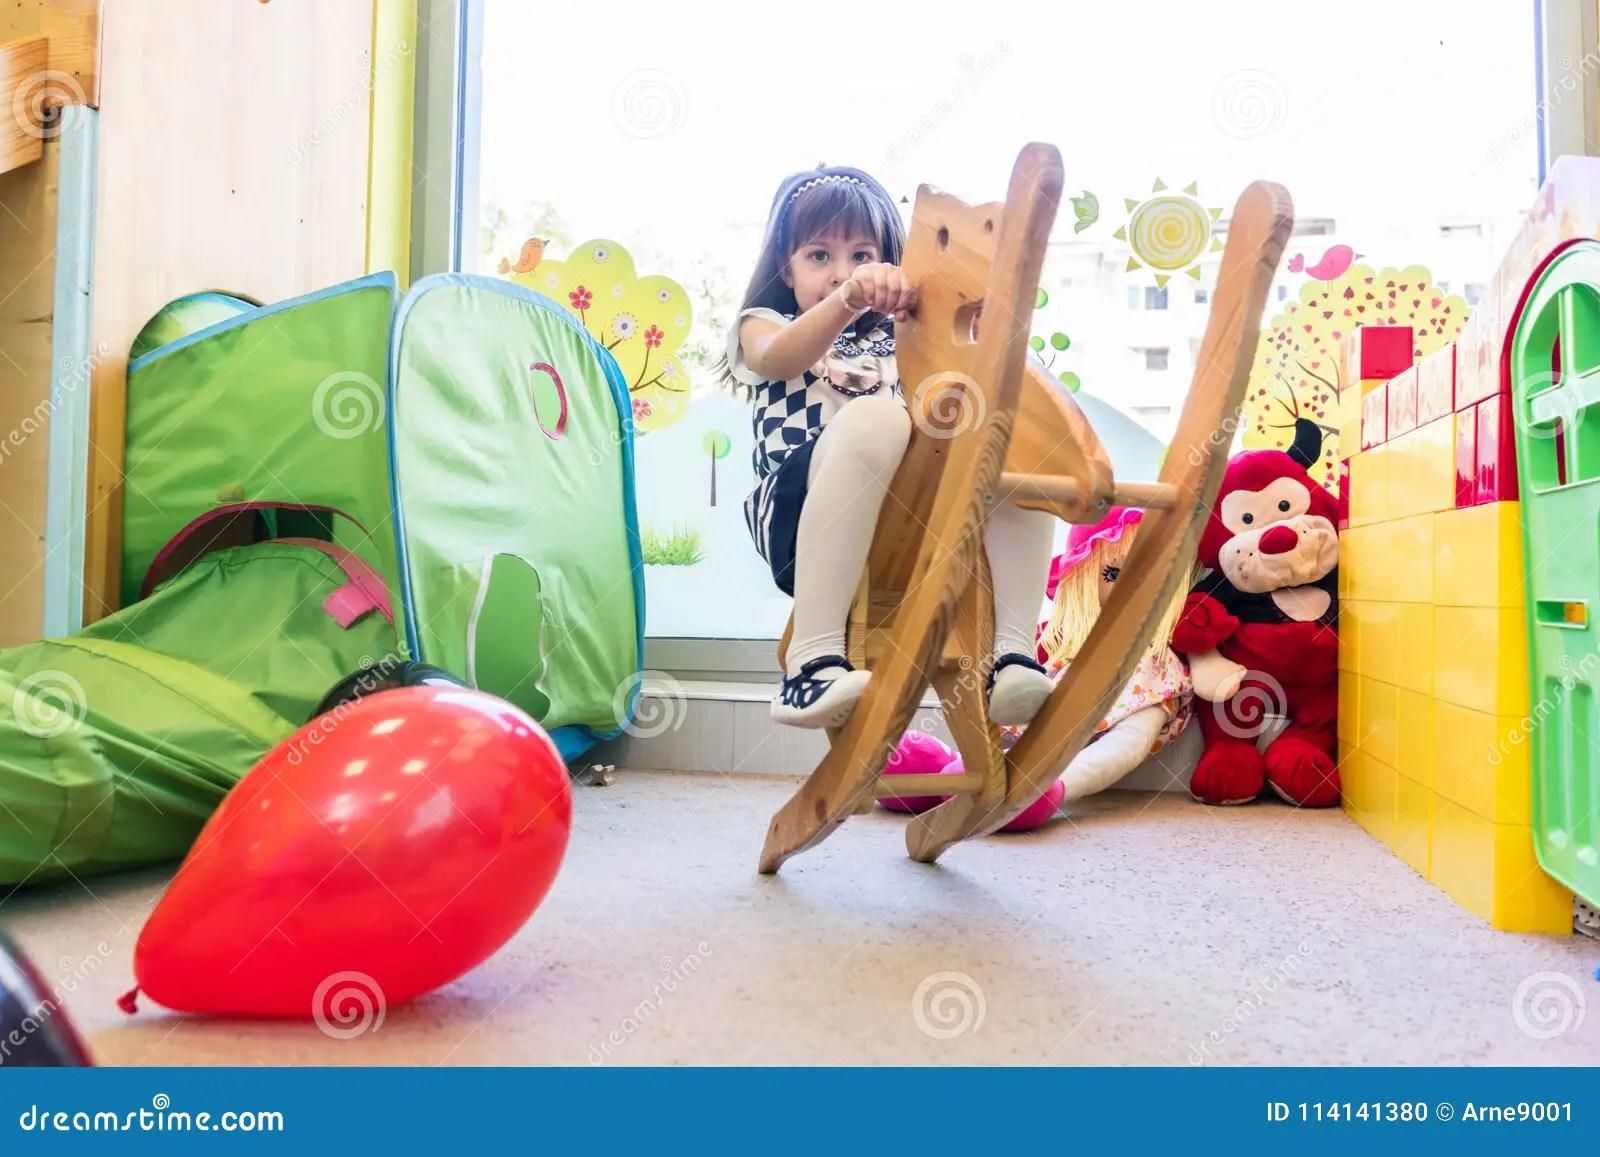 Cute Pre School Girl Swinging On A Vintage Wooden Horse